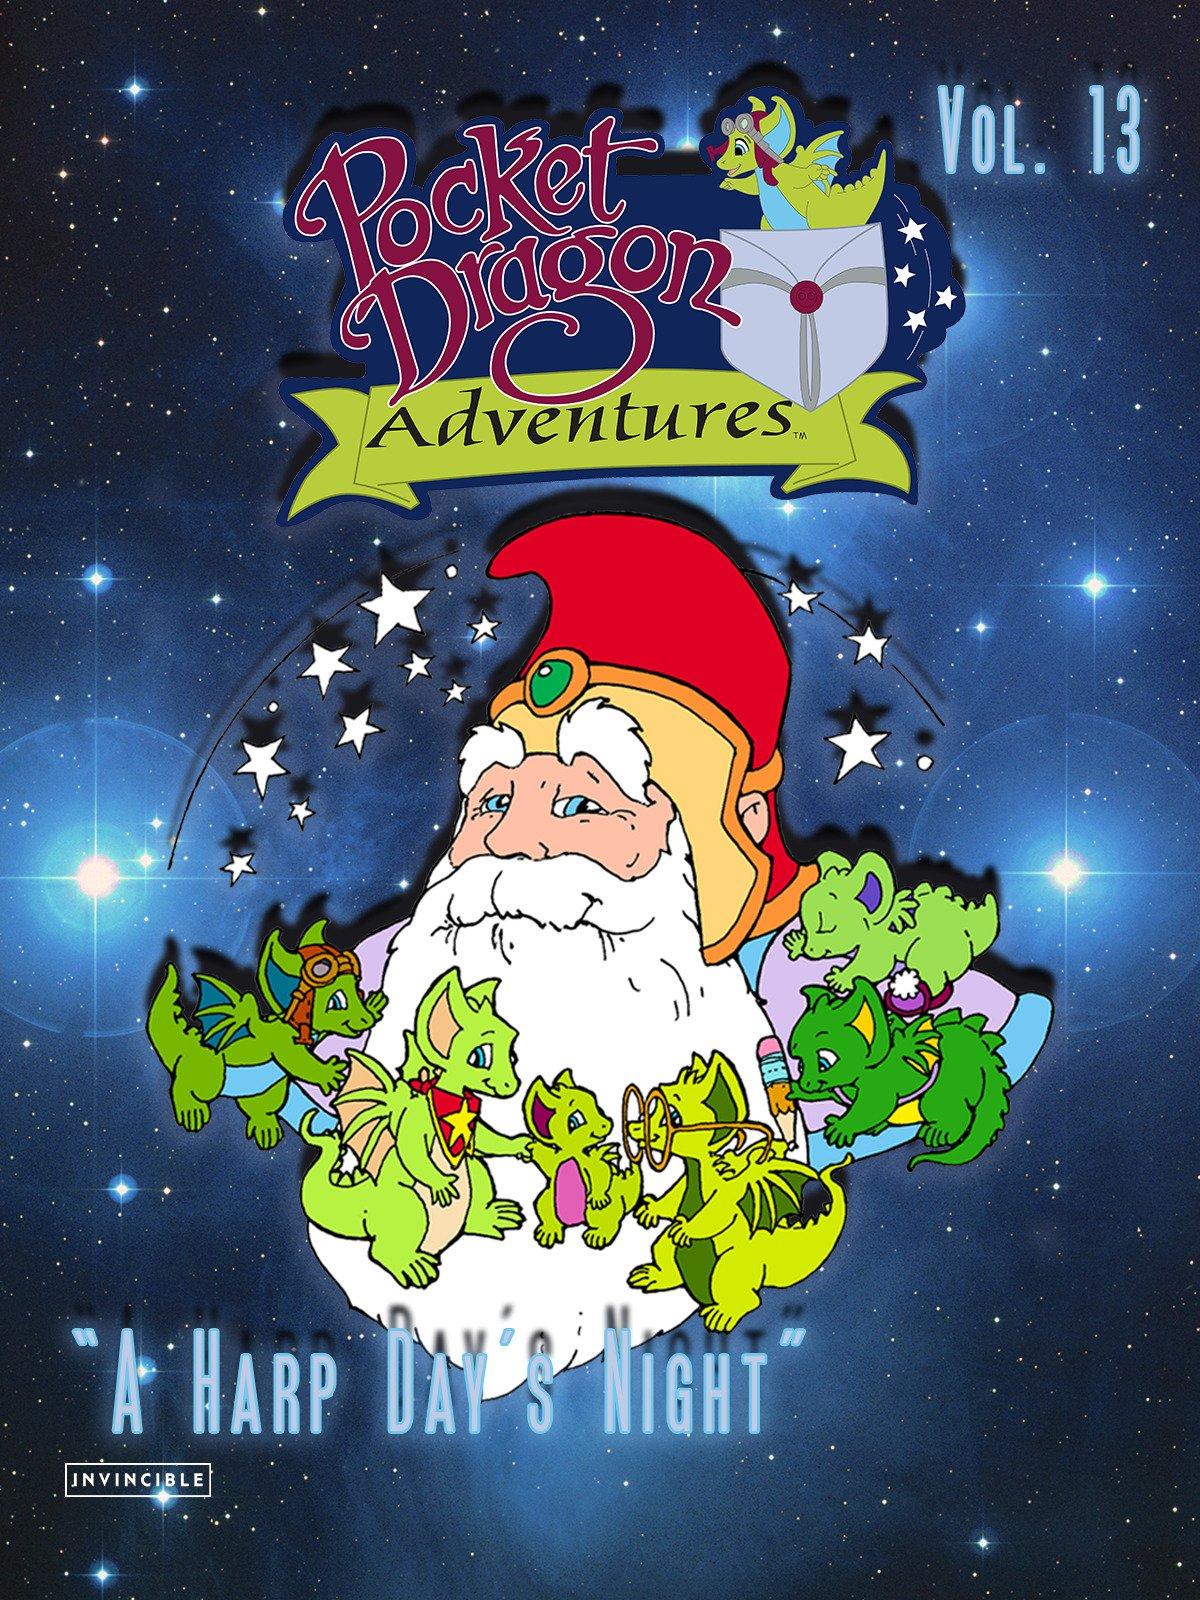 Pocket Dragon Adventures Vol. 13A Harp Day's Night